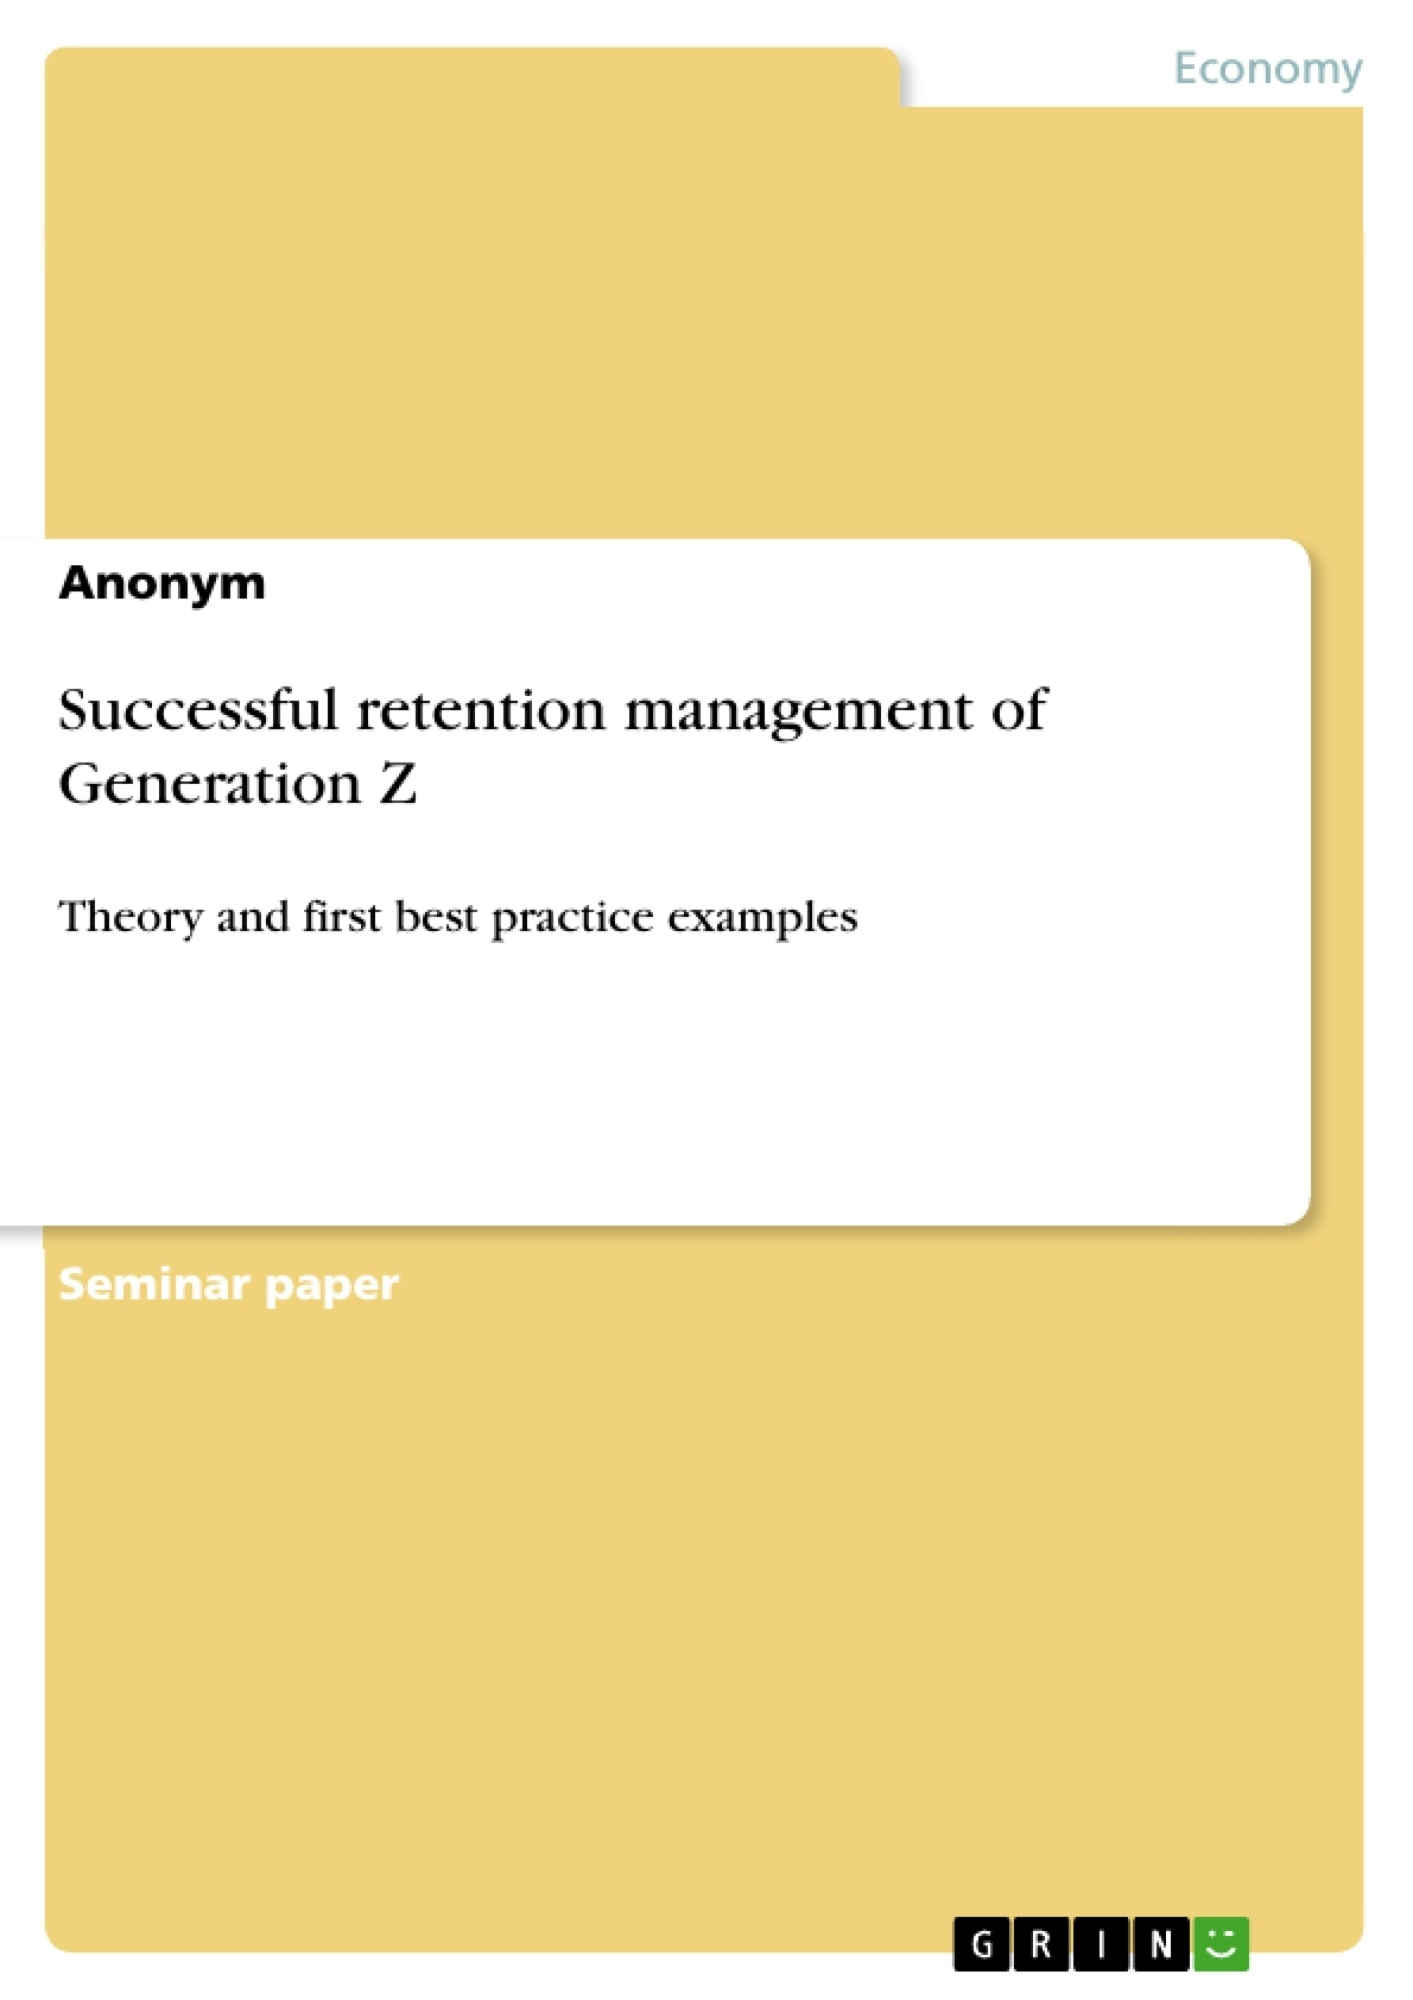 Title: Successful retention management of Generation Z